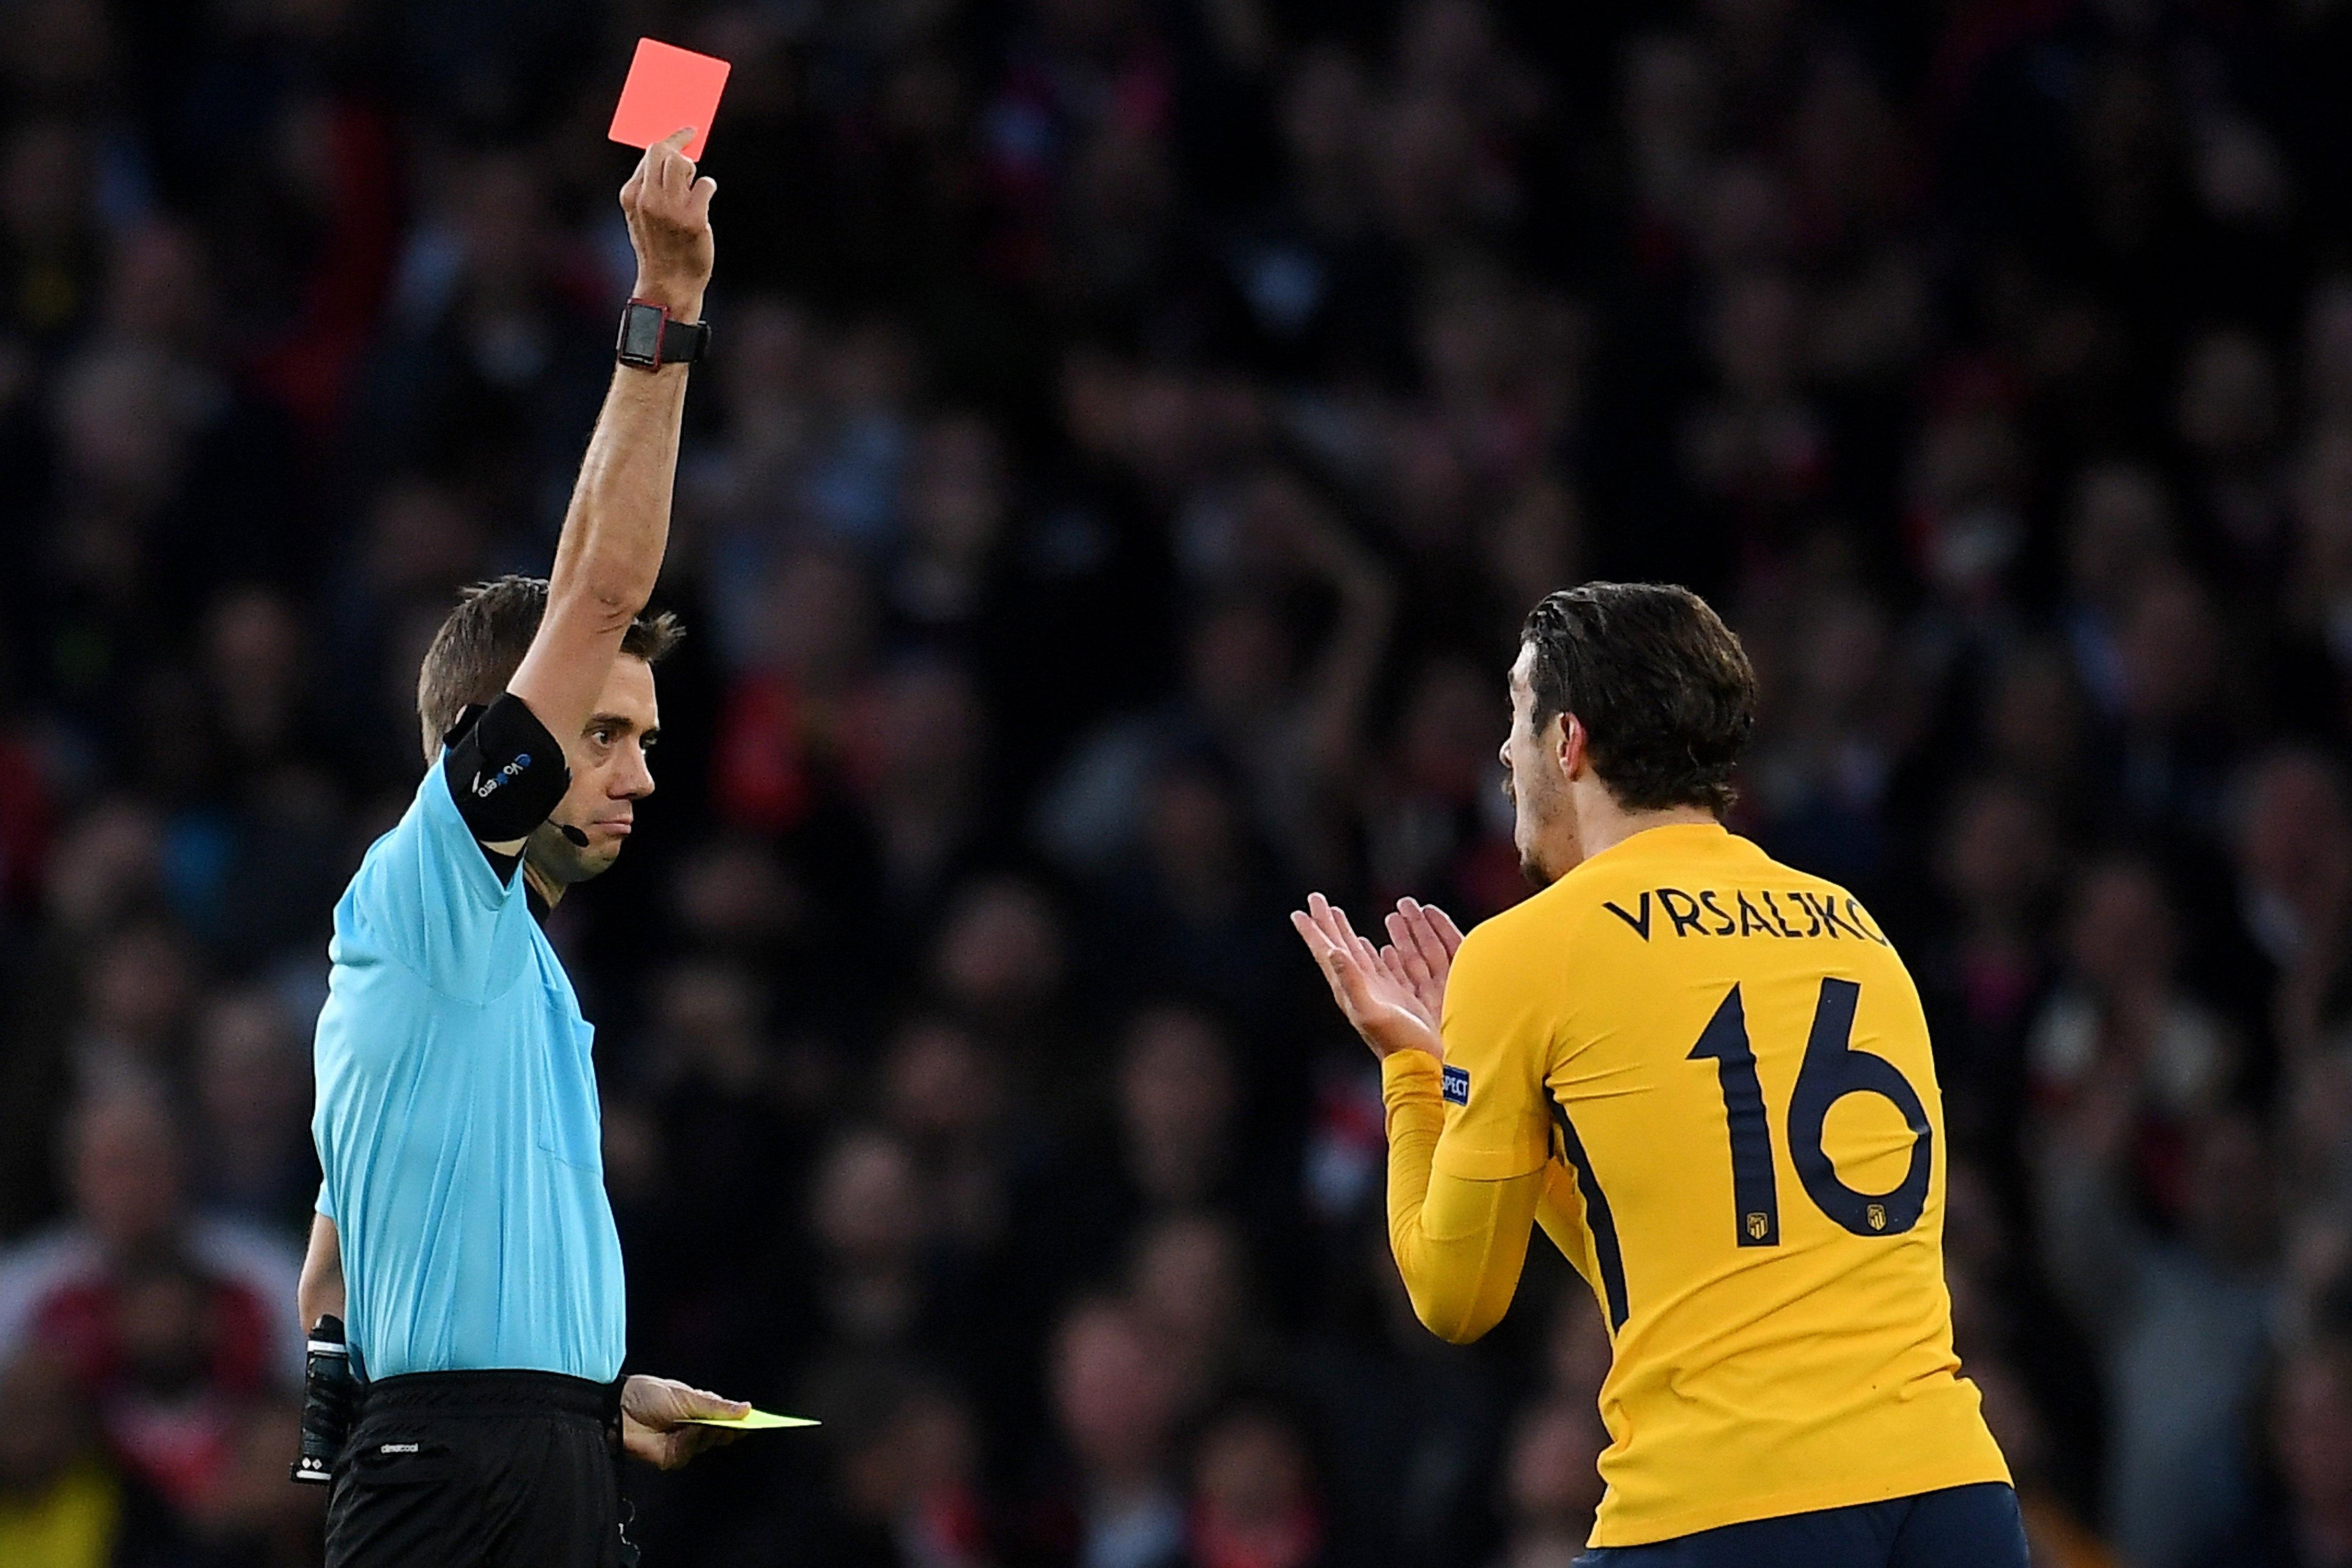 Arsenal – Atletico 1-1, Vrsaljko isključen u 10 minuti